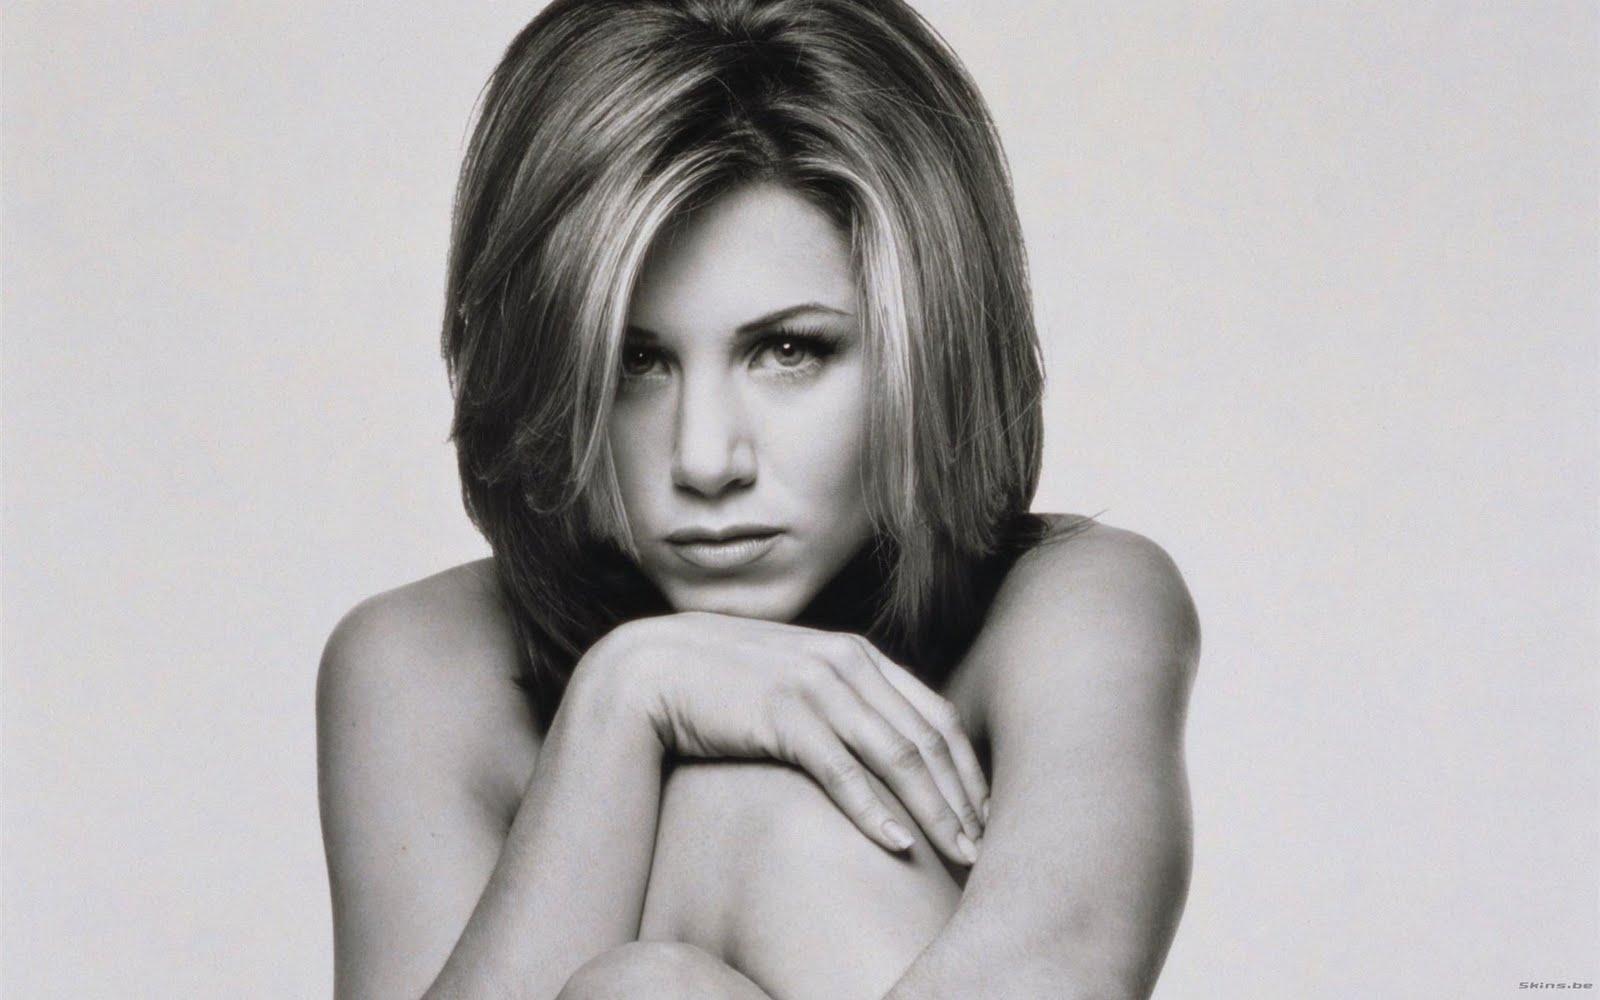 http://3.bp.blogspot.com/-tWv7k0VKKjY/TeUF3q2huCI/AAAAAAAAA2M/WDi1iHRK2Qg/s1600/Jennifer-Aniston-hot%252BJennifer-Aniston-hot%252BJennifer-Aniston-hot%252BJennifer-Aniston-hot%252BJennifer-Aniston-hot%252BJennifer-Aniston-hot.jpg